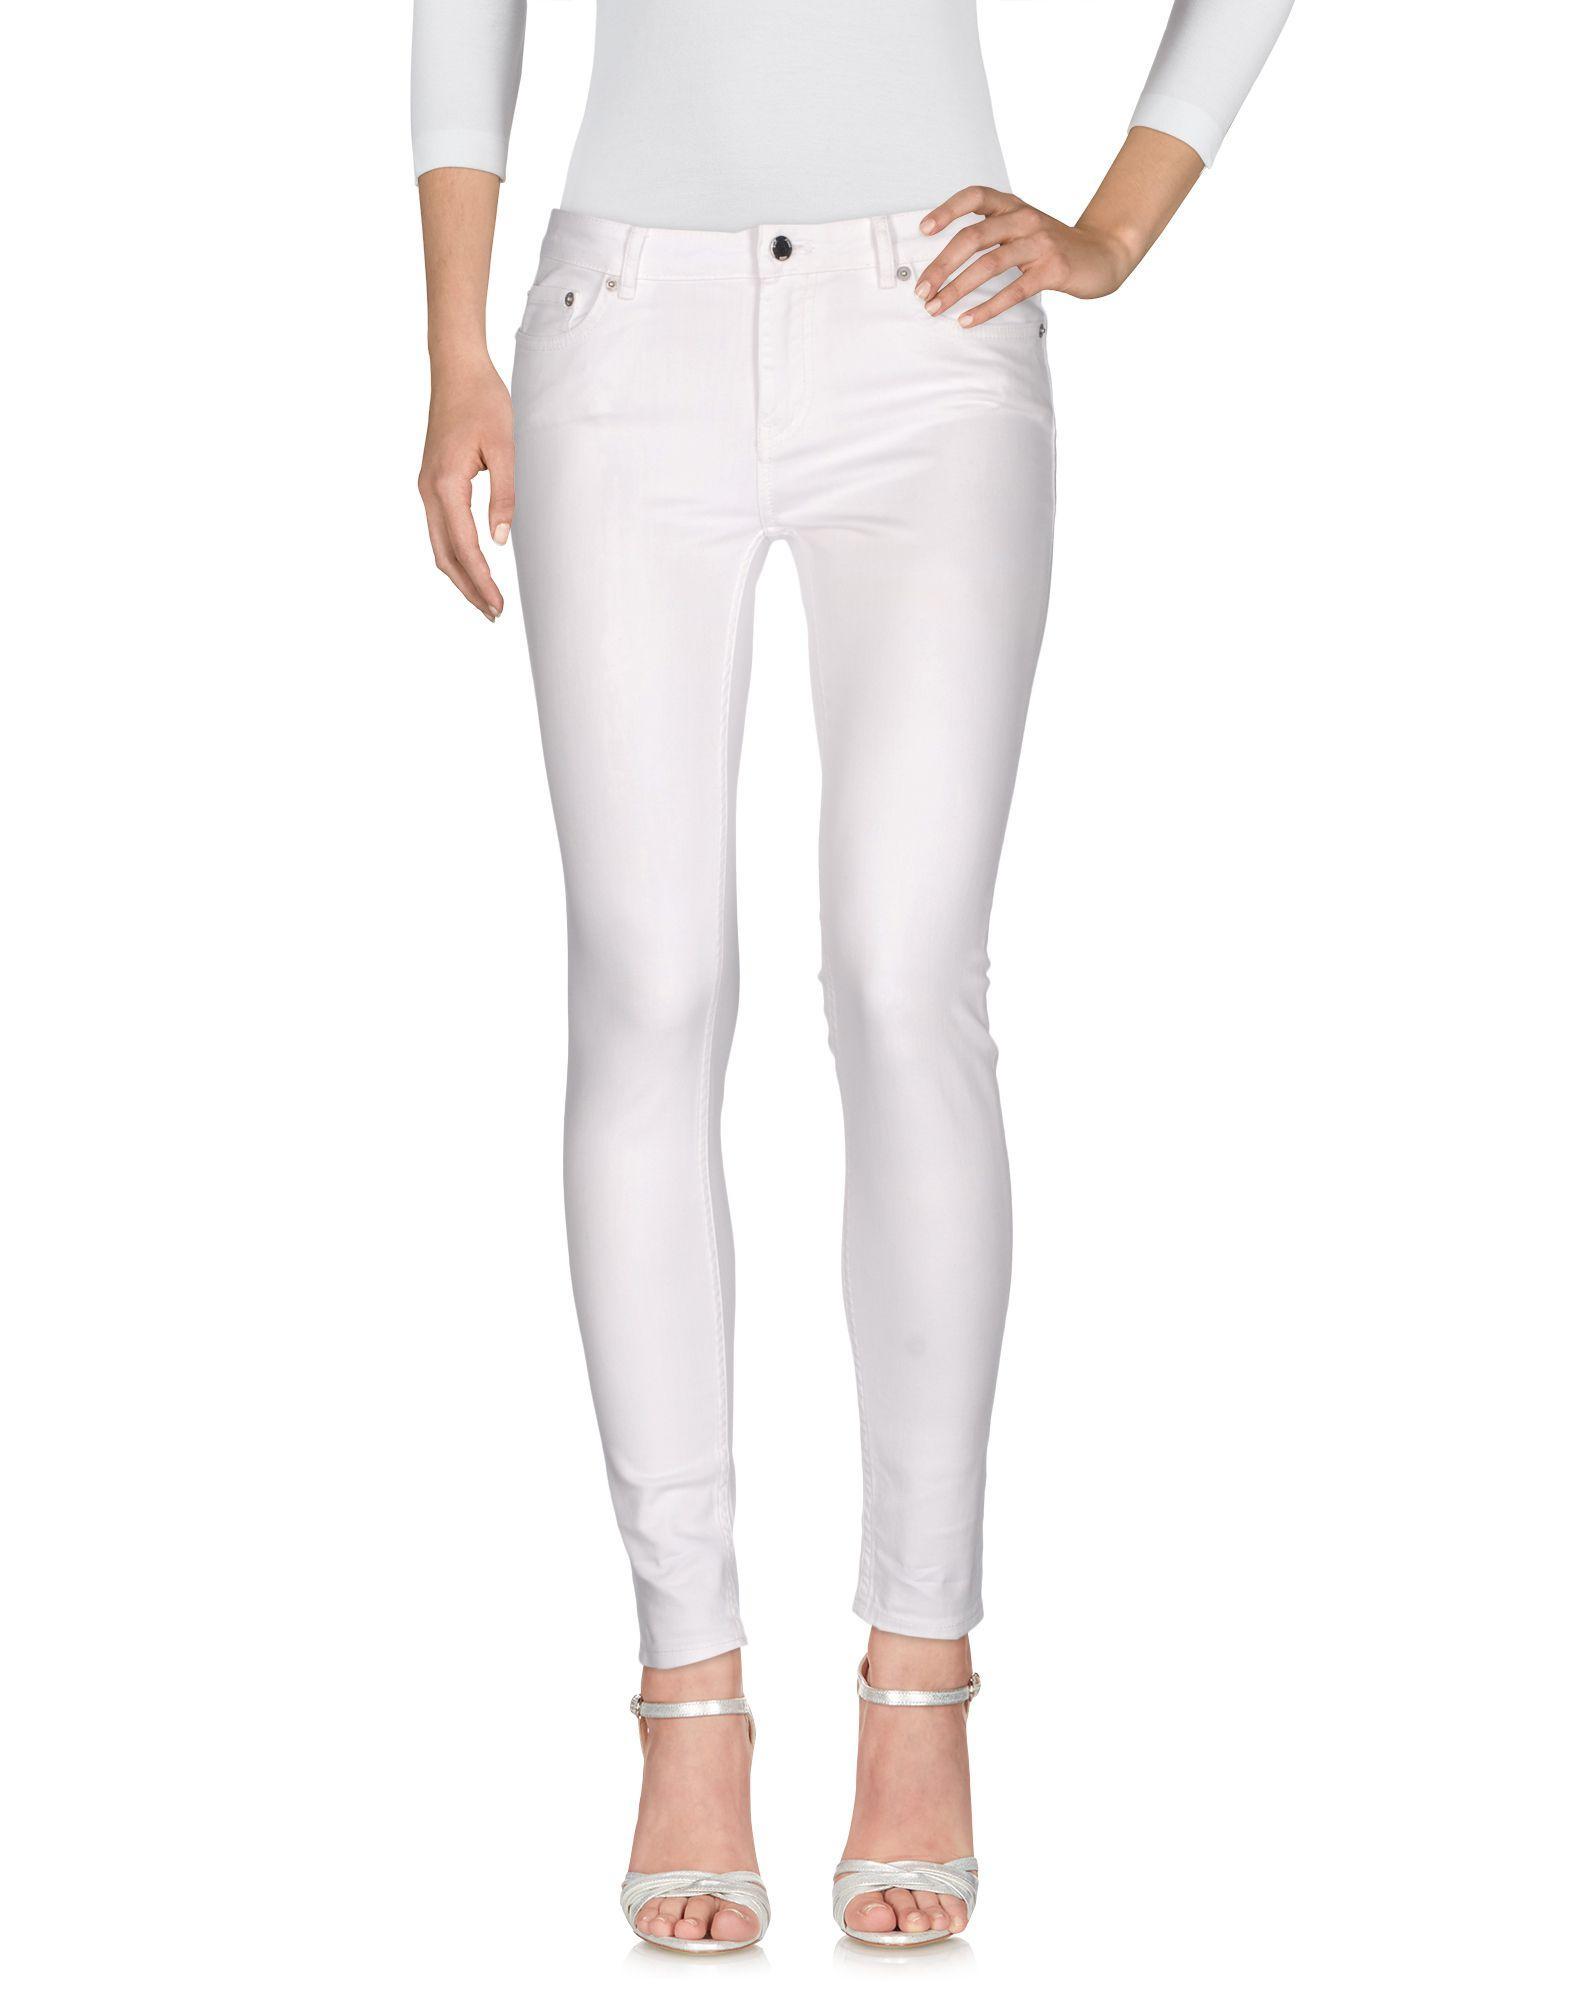 Blk Dnm Denim Pants In White